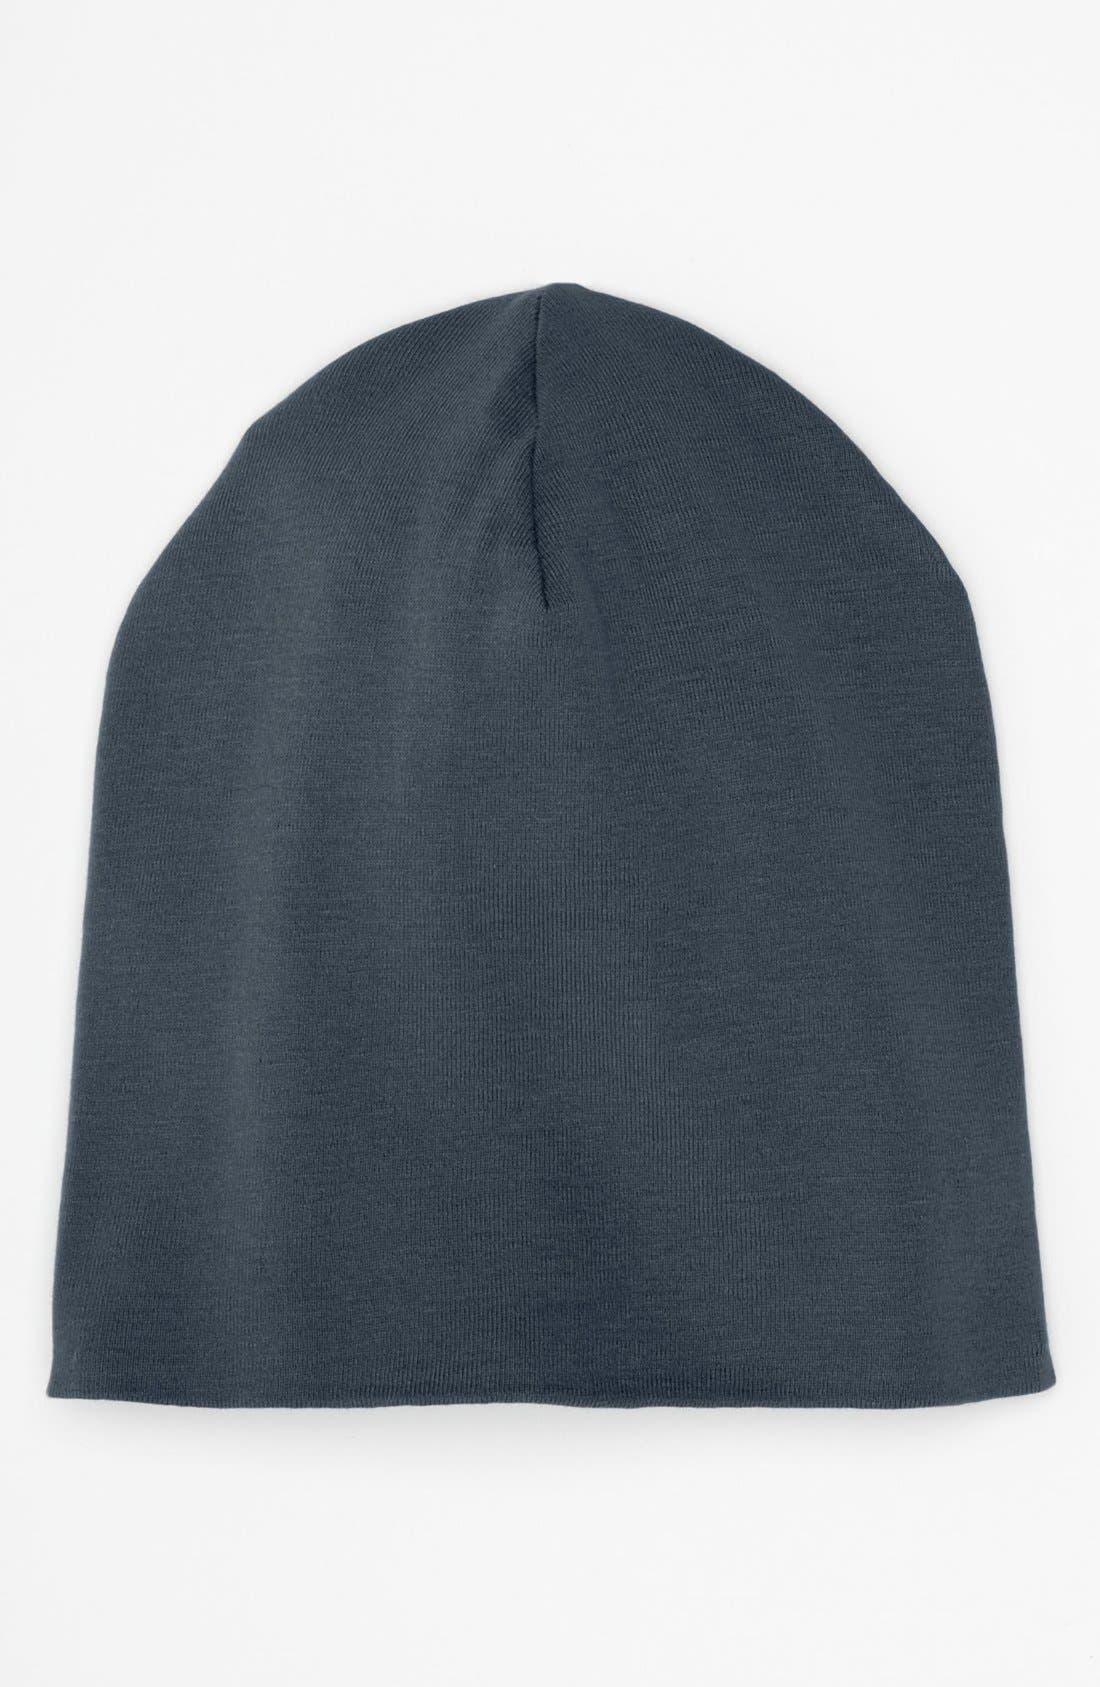 Main Image - Peek 'Little Peanut' Hat (Toddler)